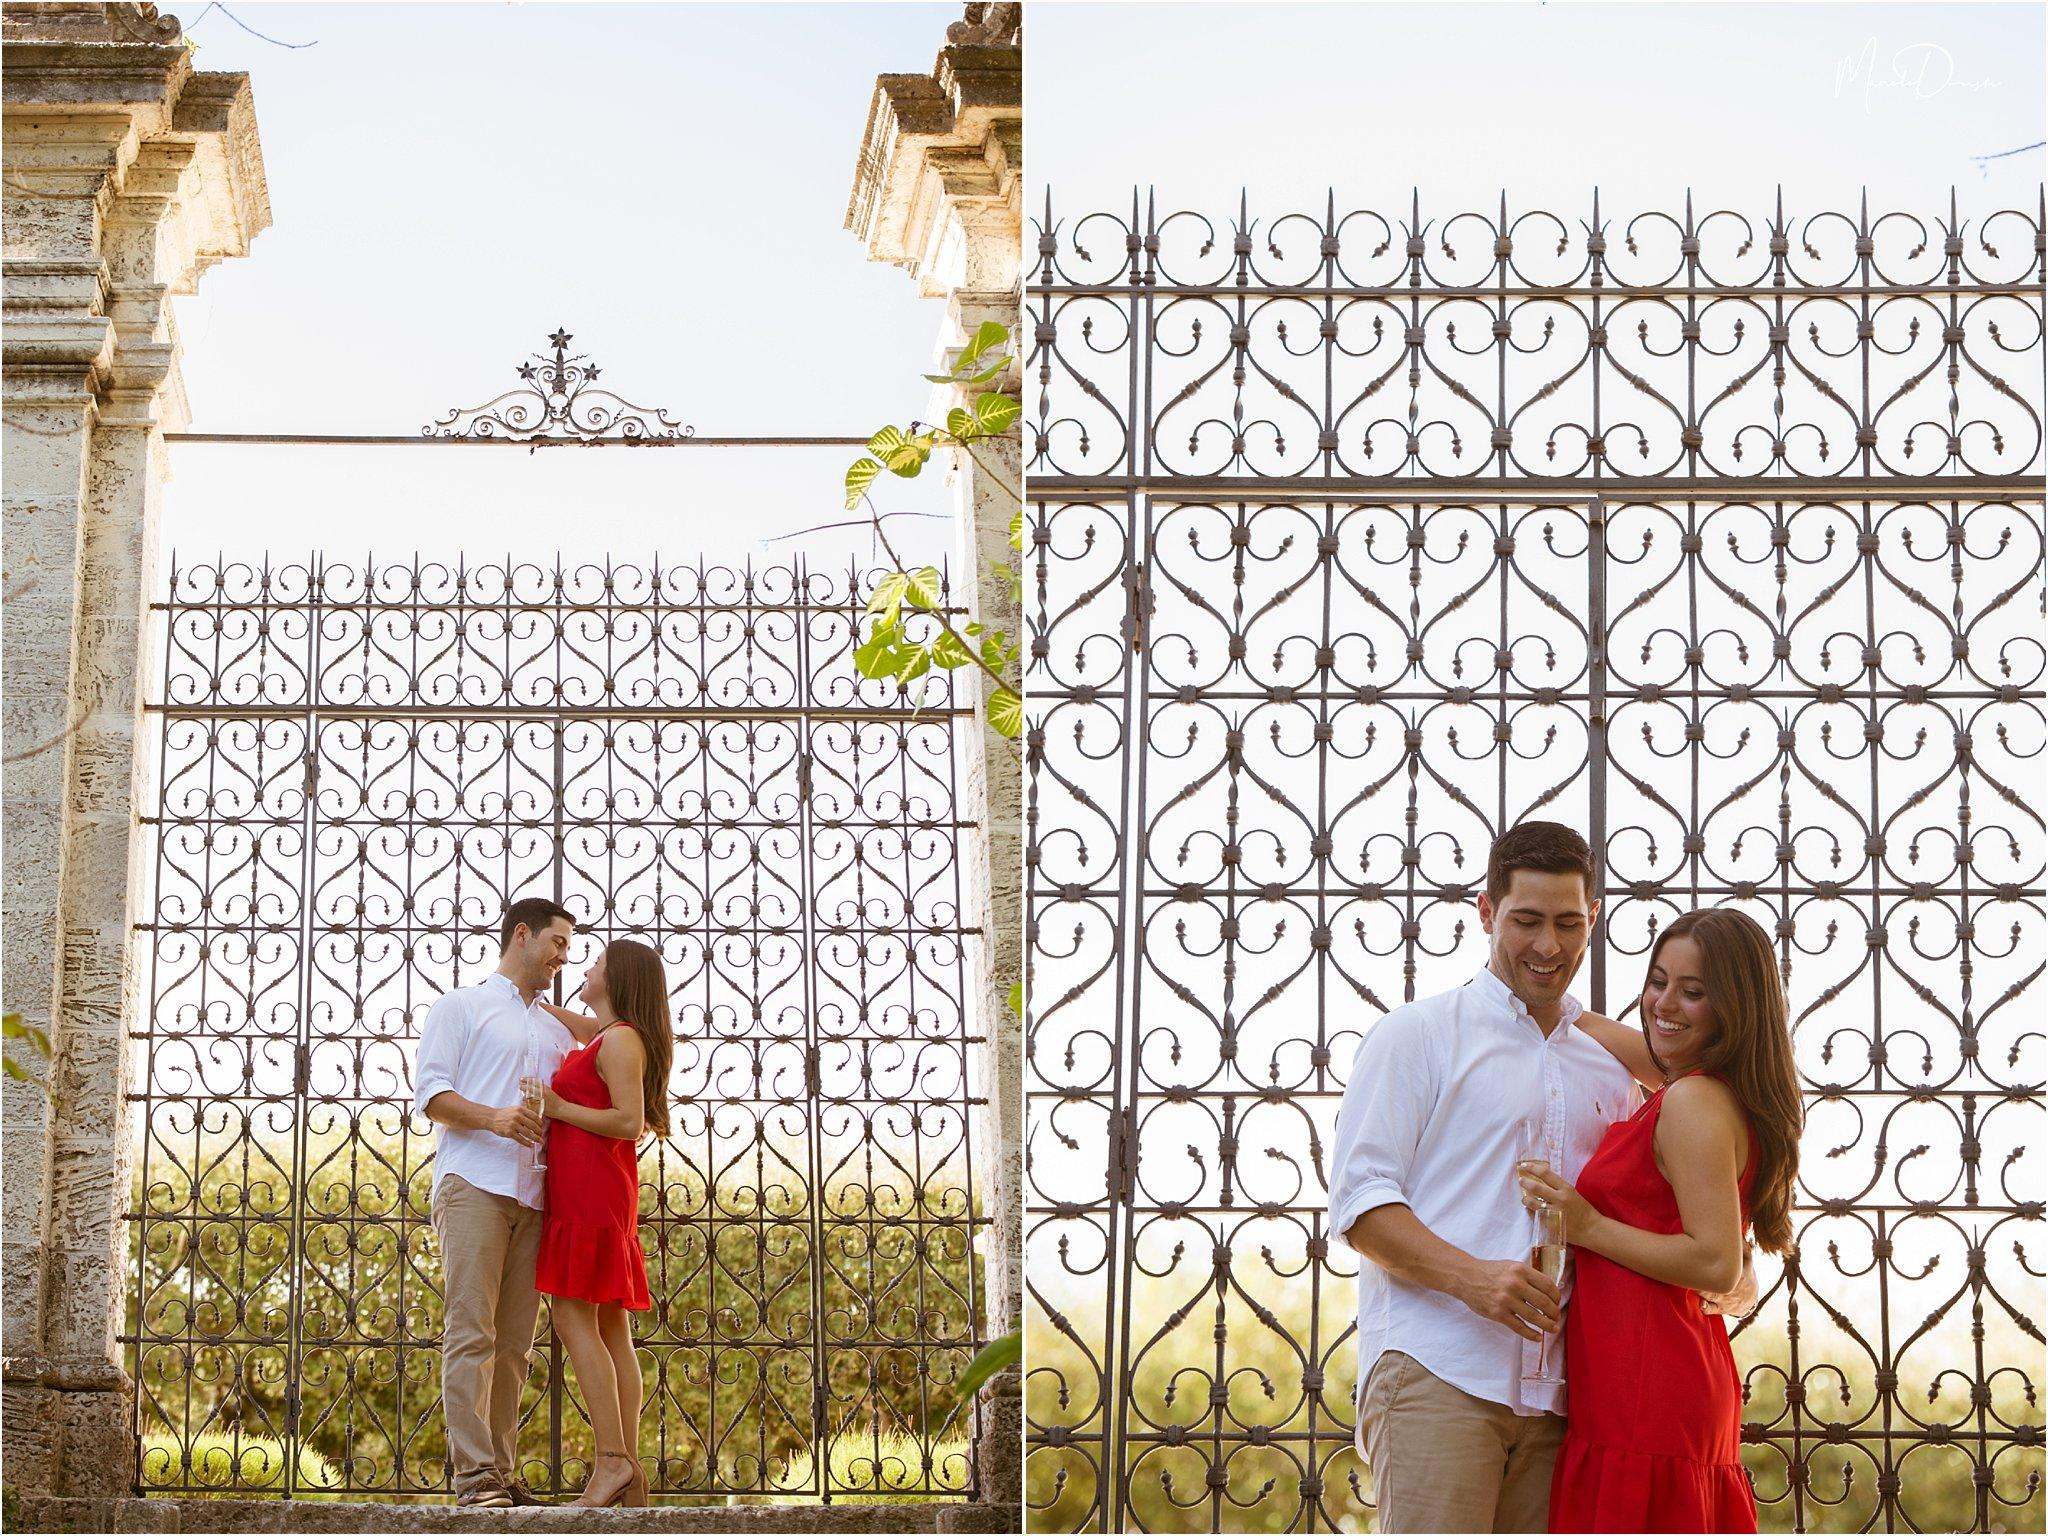 00867_ManoloDoreste_InFocusStudios_Wedding_Family_Photography_Miami_MiamiPhotographer.jpg